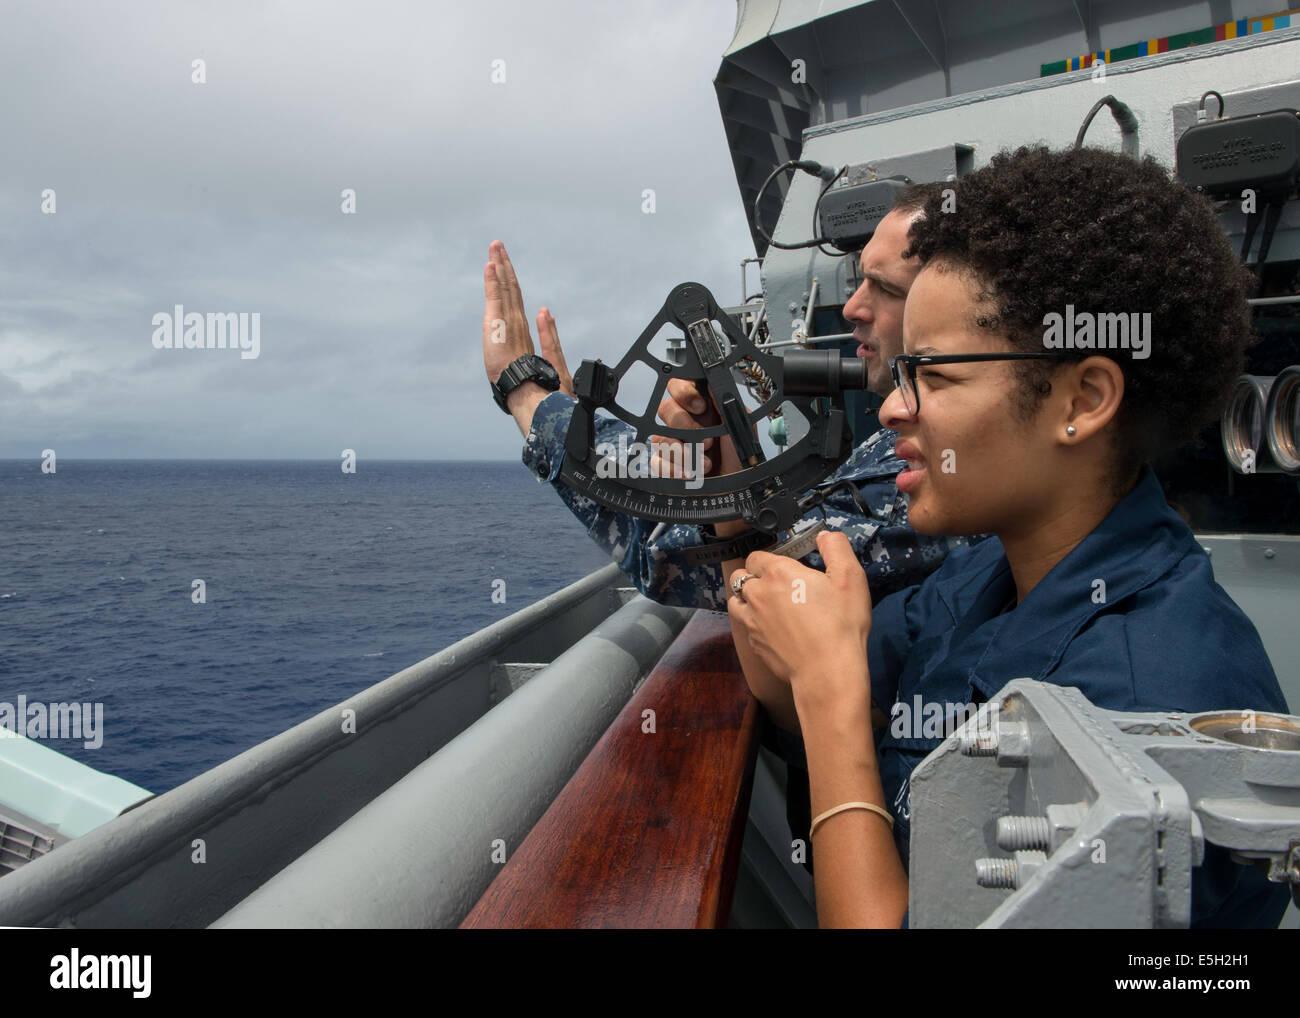 us navy quartermaster 1st class clarence ilijic left teaches quartermaster seaman eden boyd how